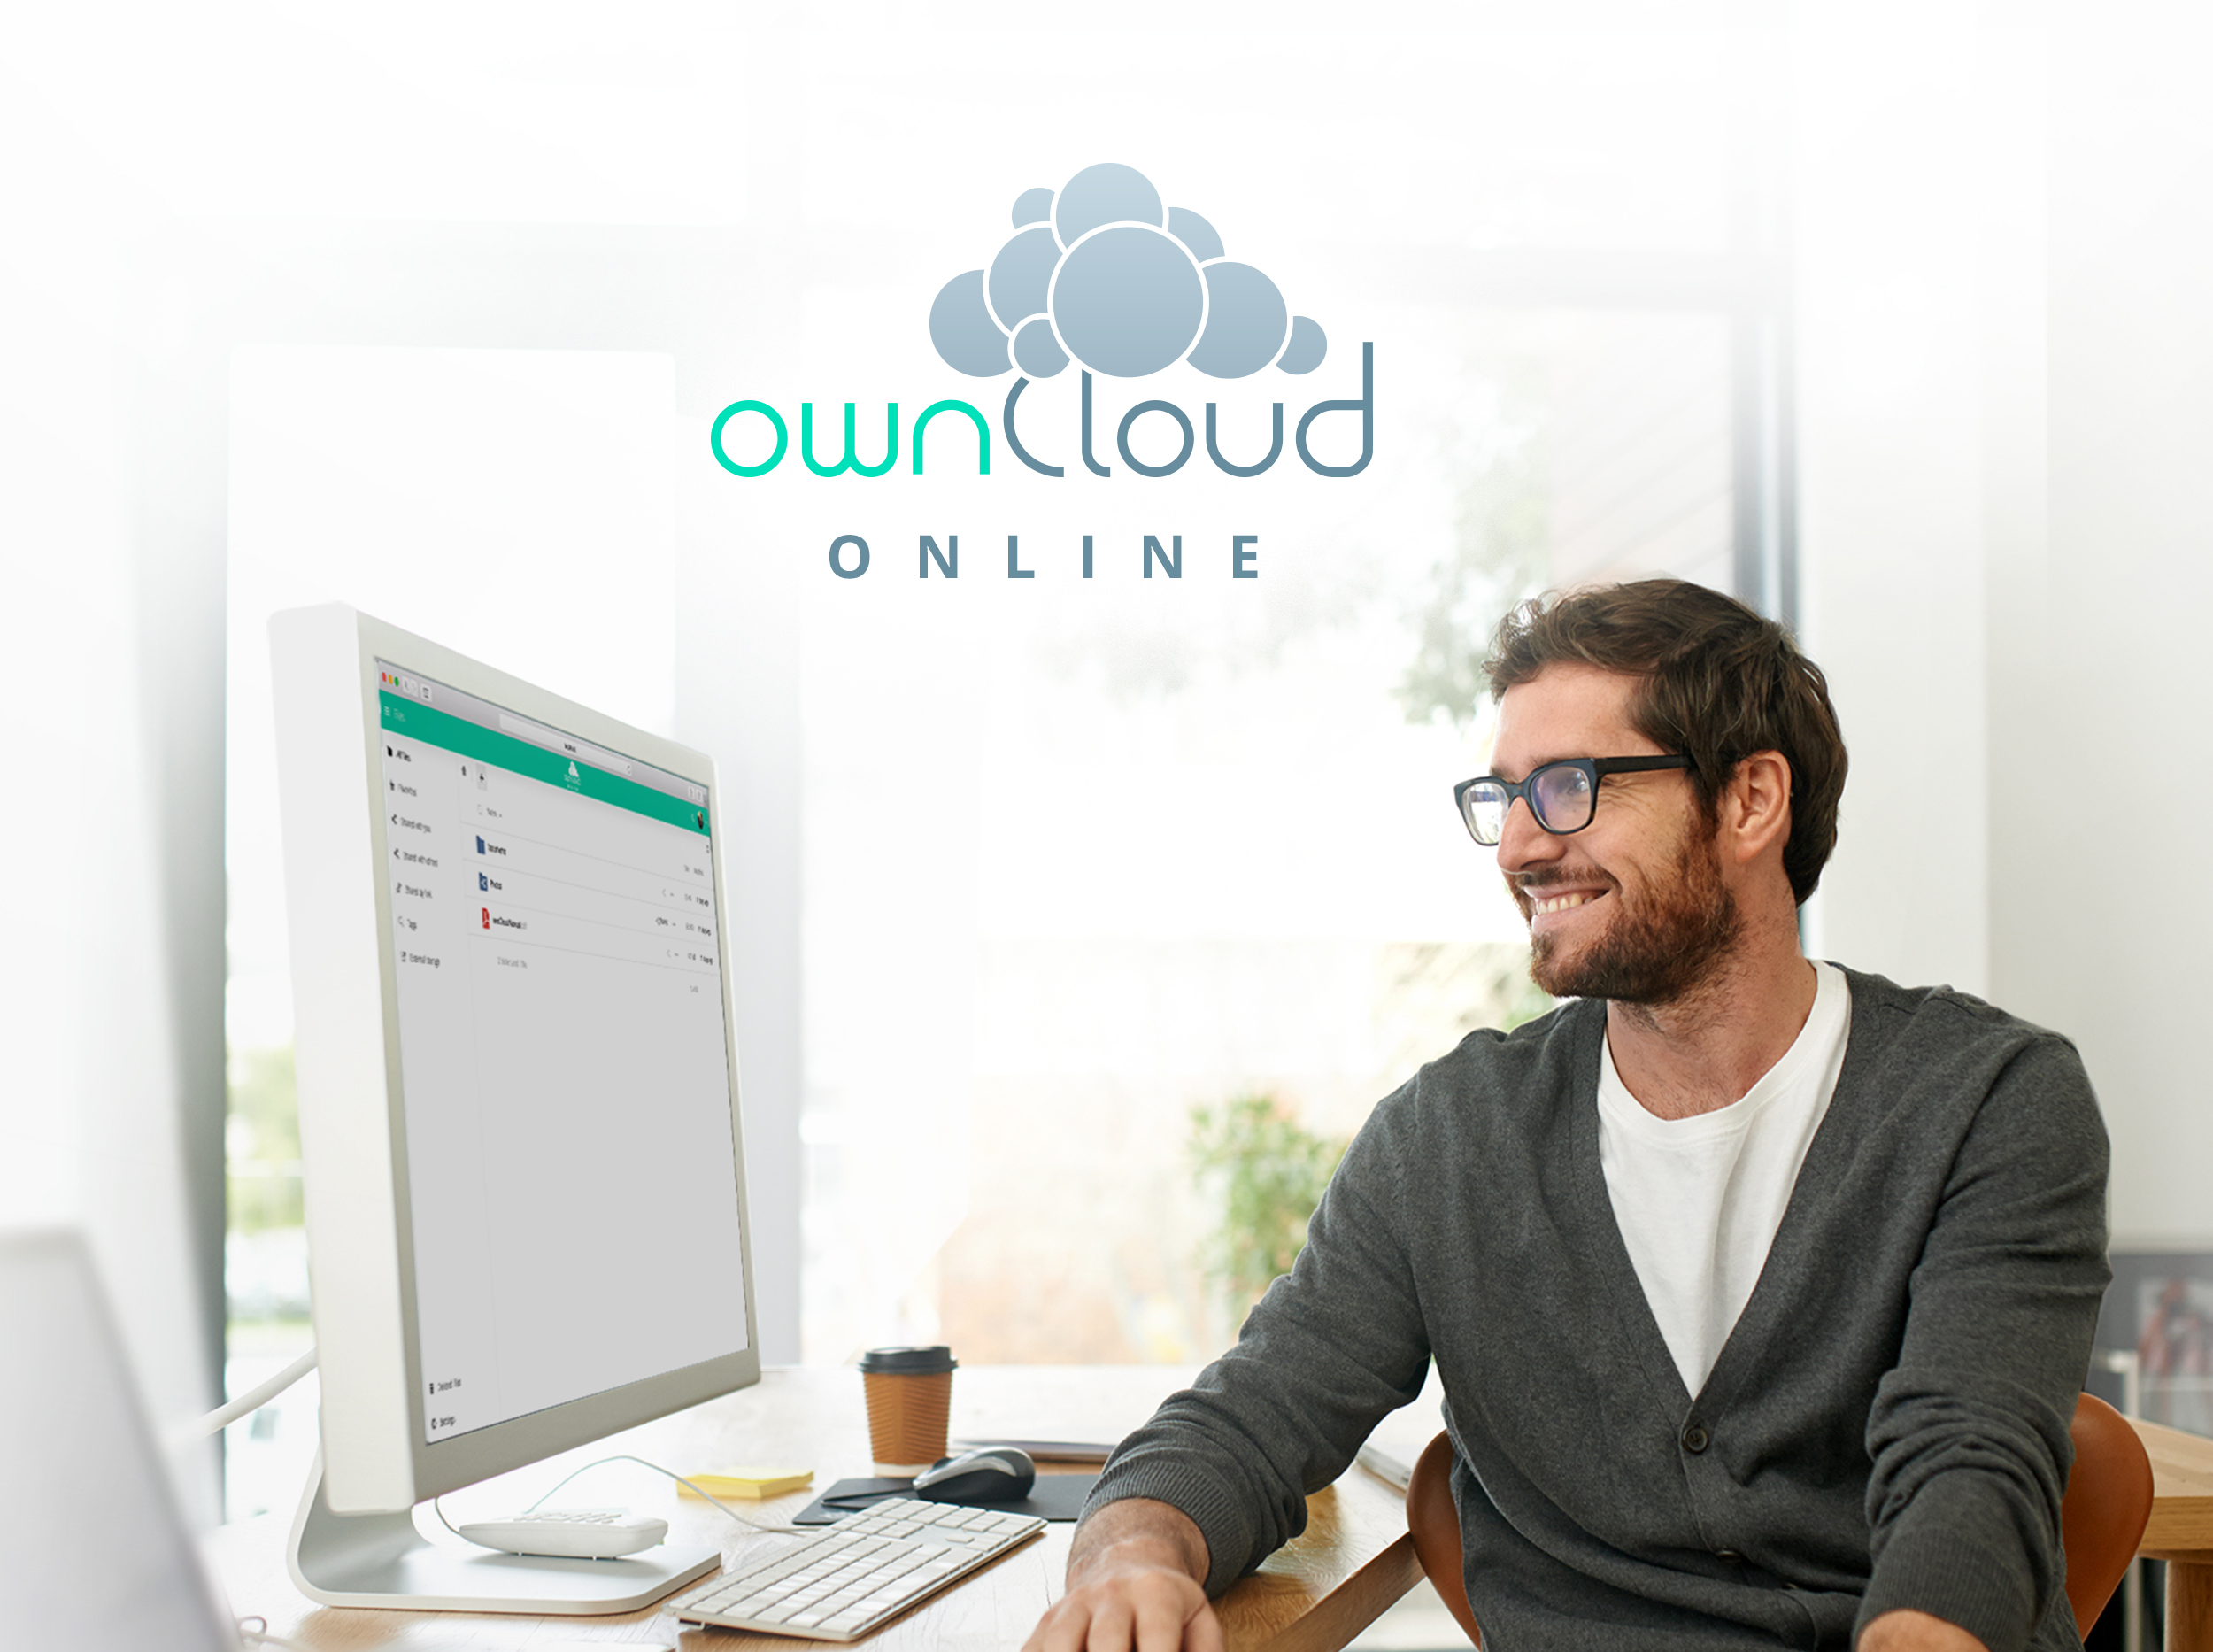 ownCloud online Keyvisual